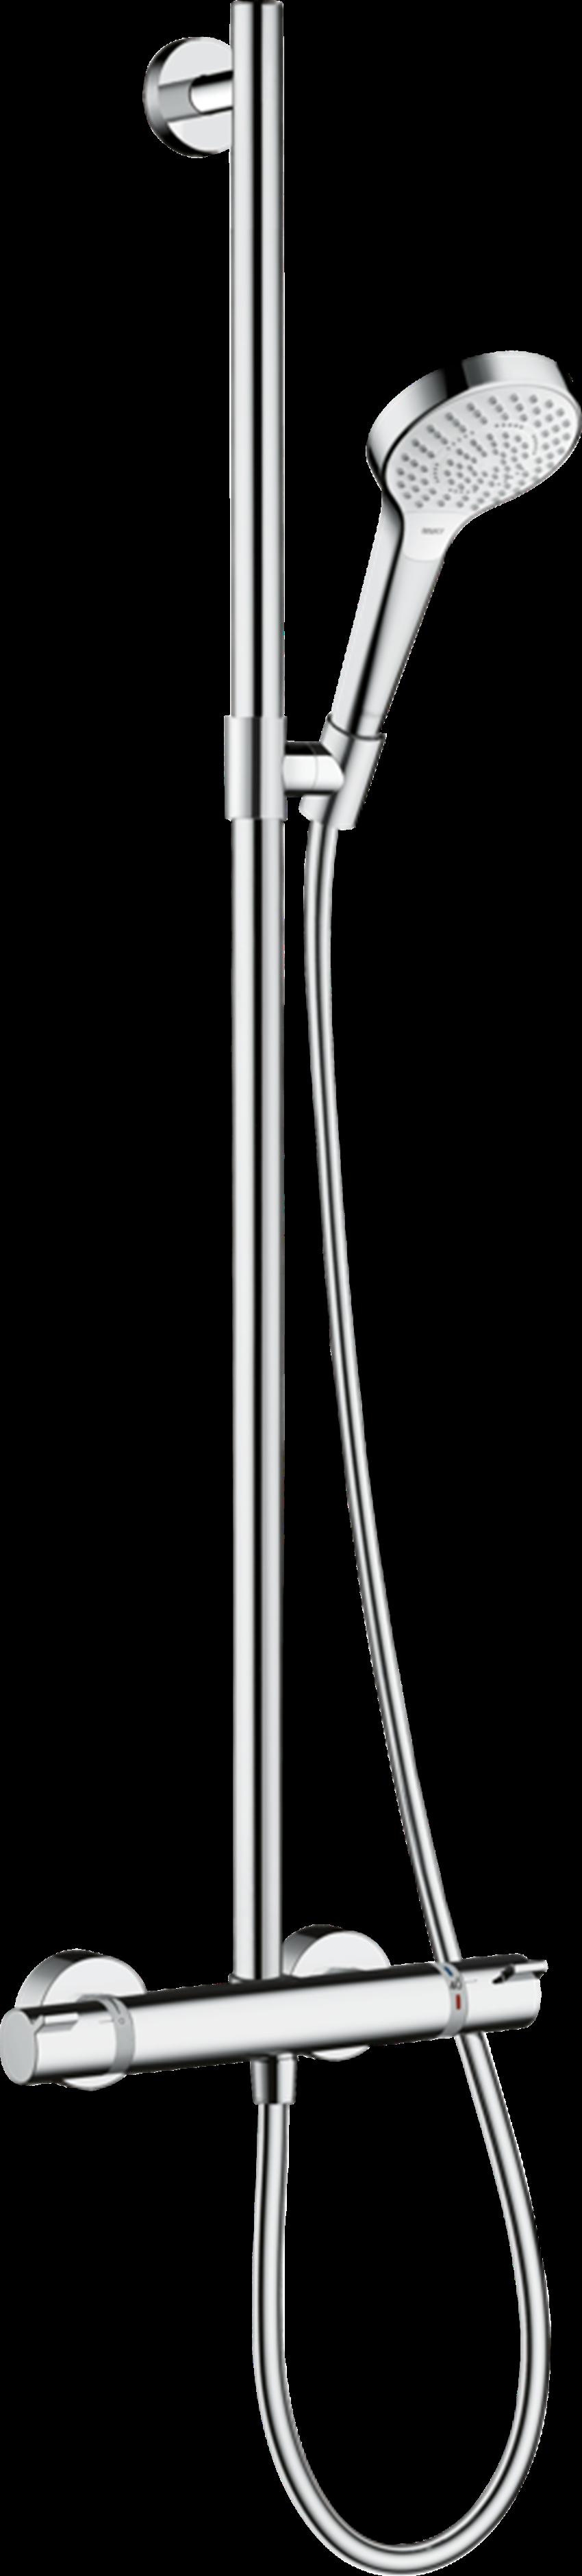 Komplet prysznicowy SemiPipe Multi z termostatem Hansgrohe Croma Select S